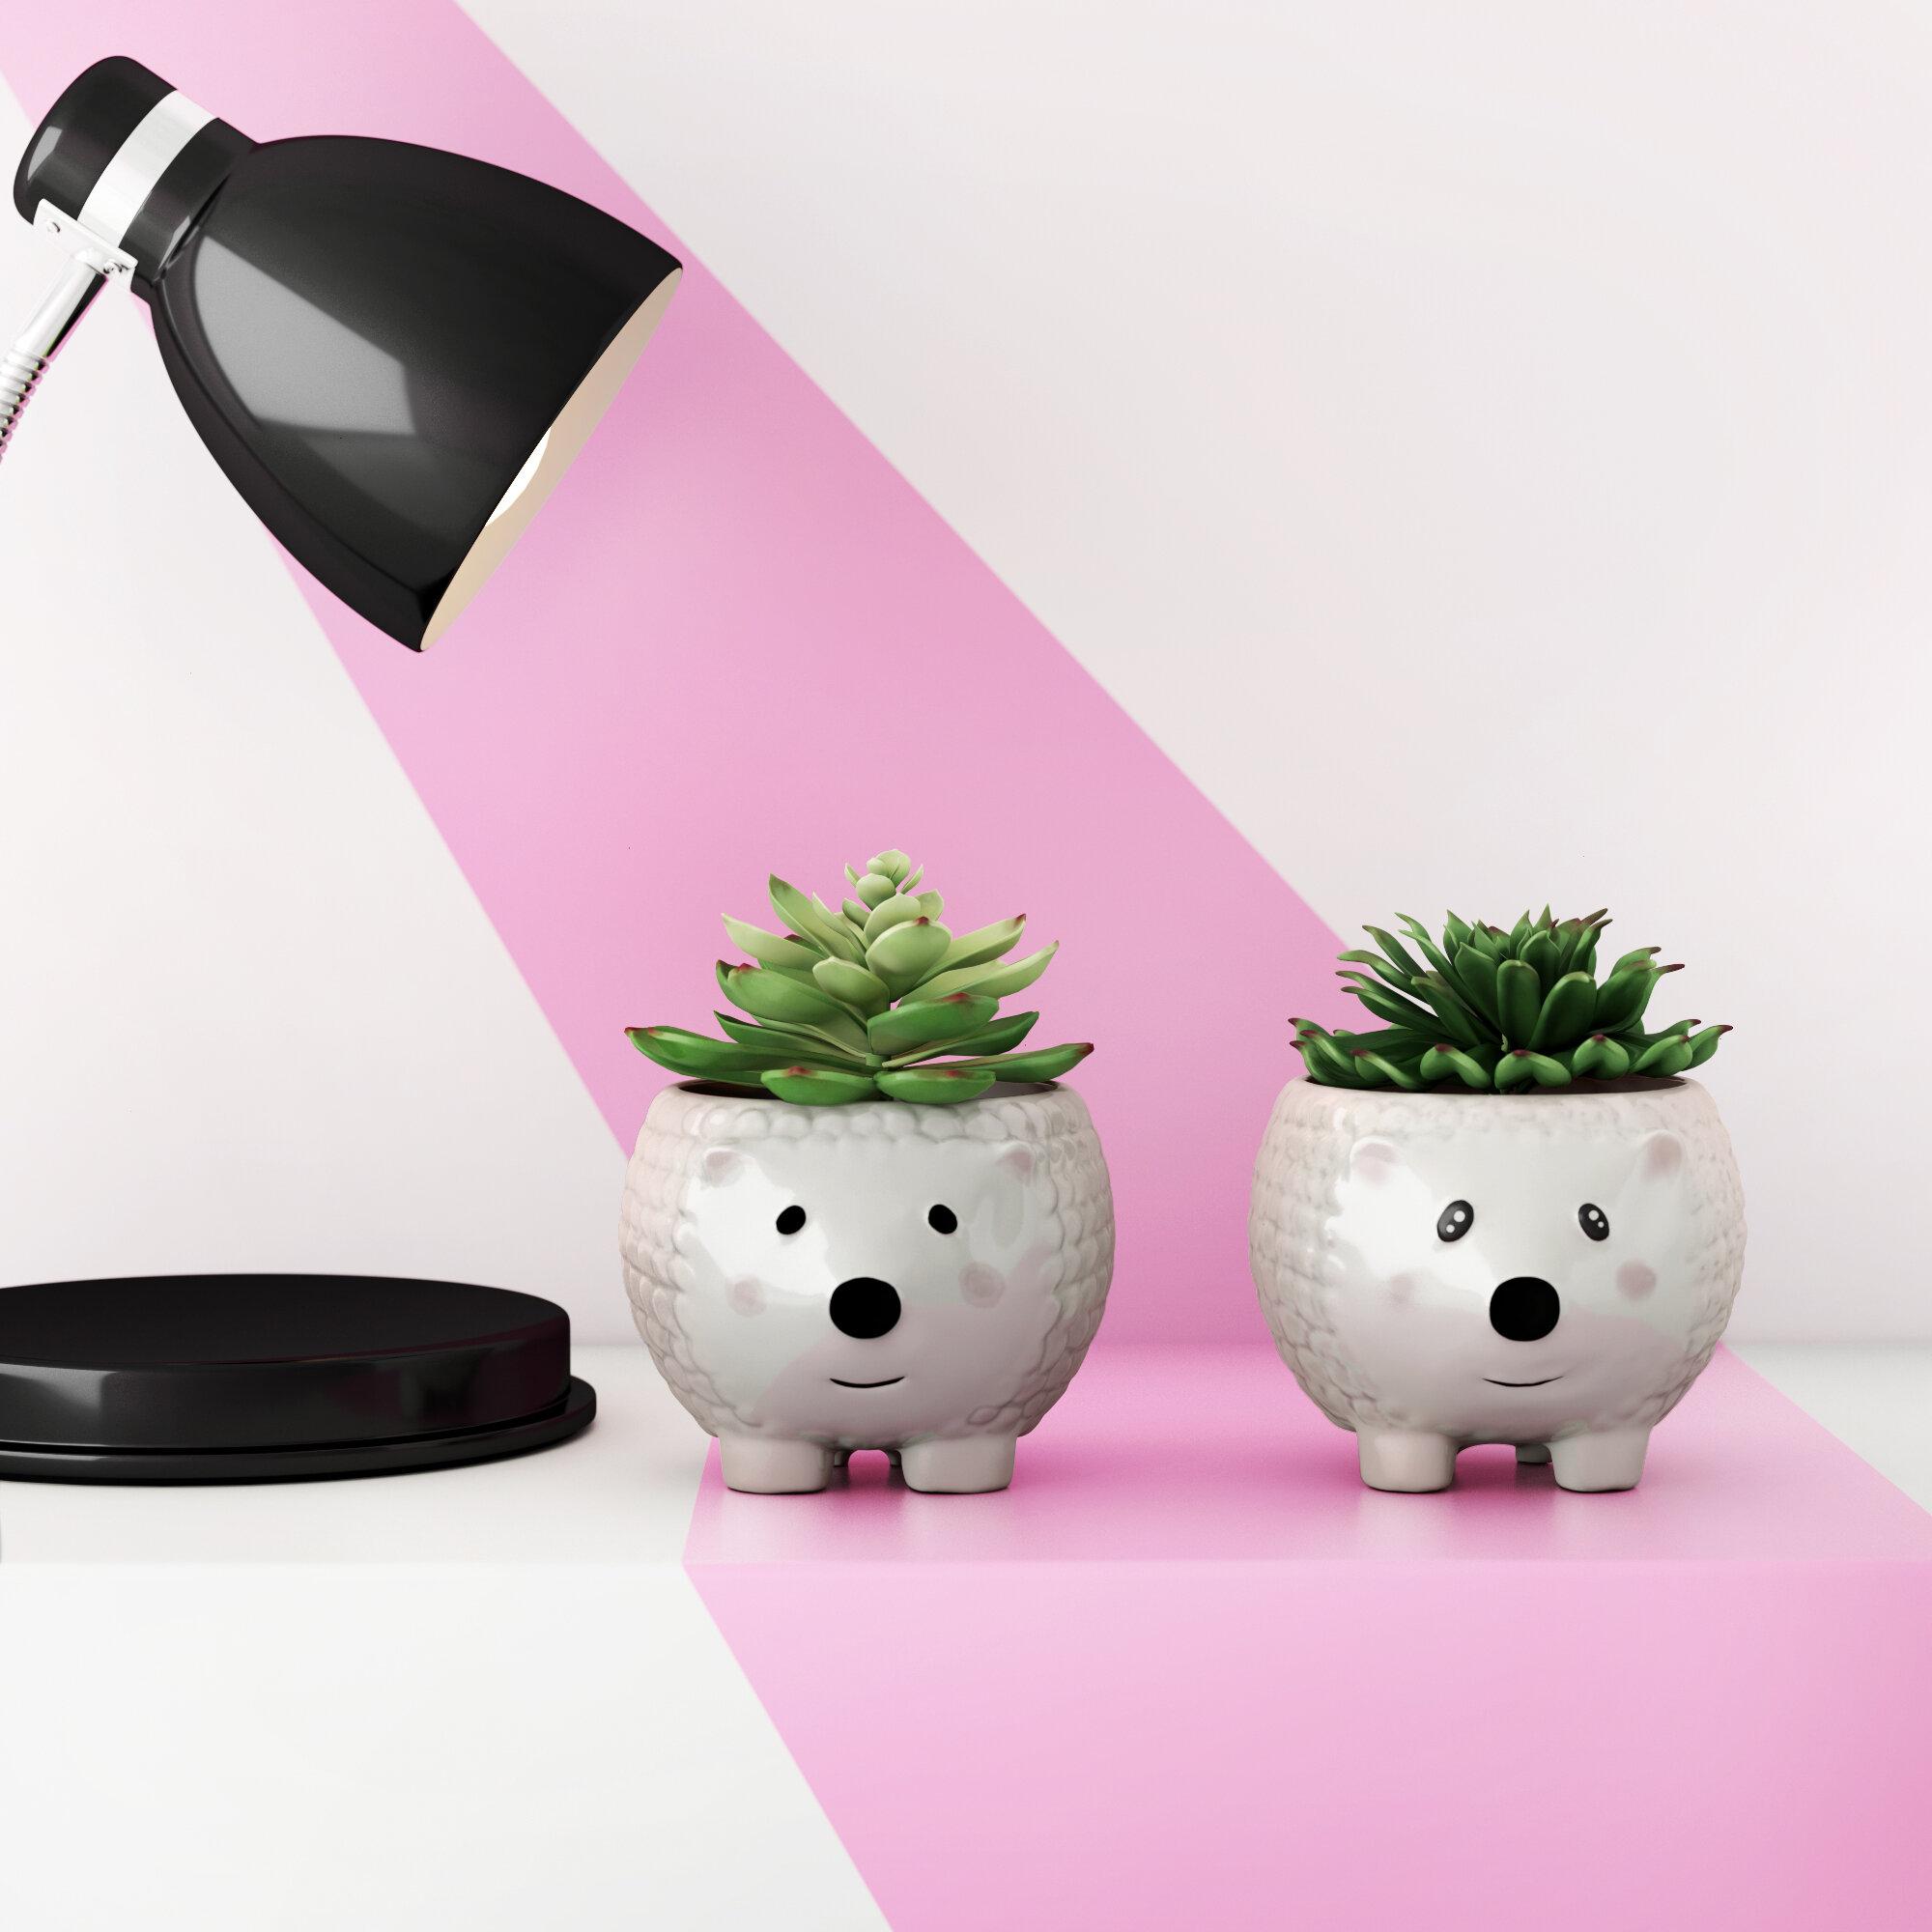 Hashtag Home 2 Piece Faux Hedgehog Ceramic Agave Plant In Planter Set Reviews Wayfair